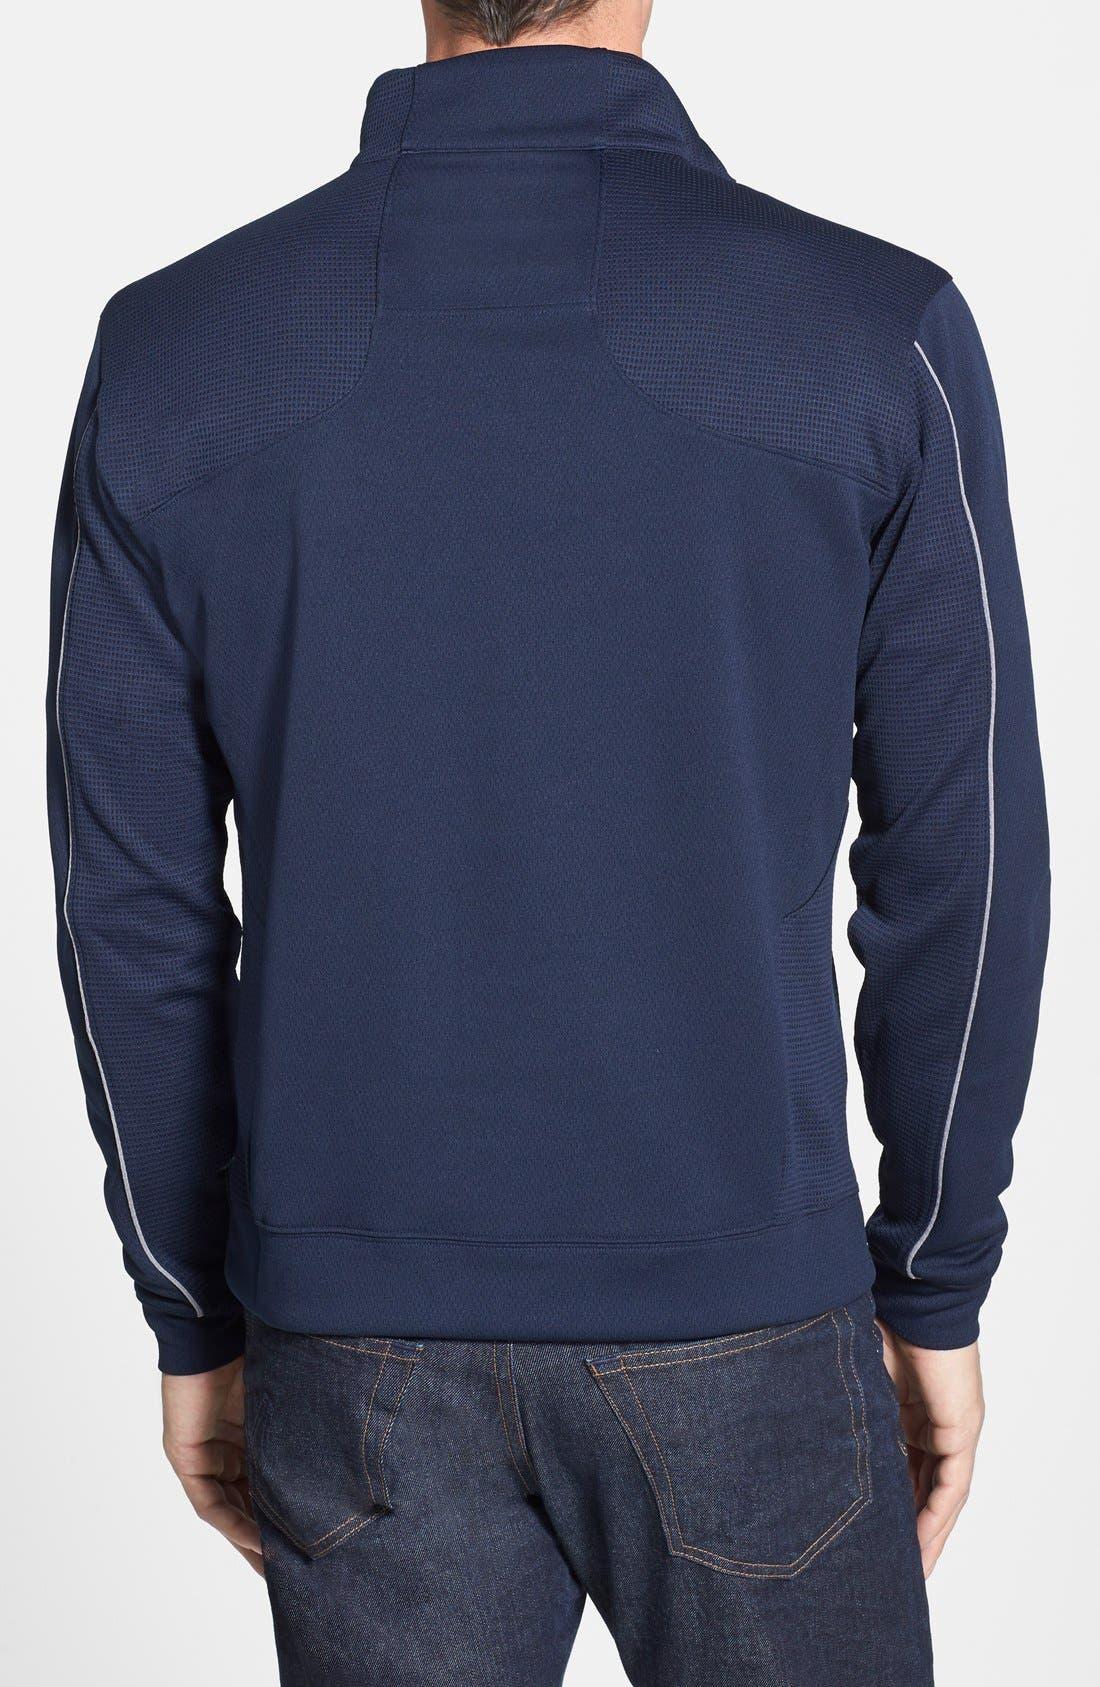 Tennessee Titans - Edge DryTec Moisture Wicking Half Zip Pullover,                             Alternate thumbnail 2, color,                             Navy Blue